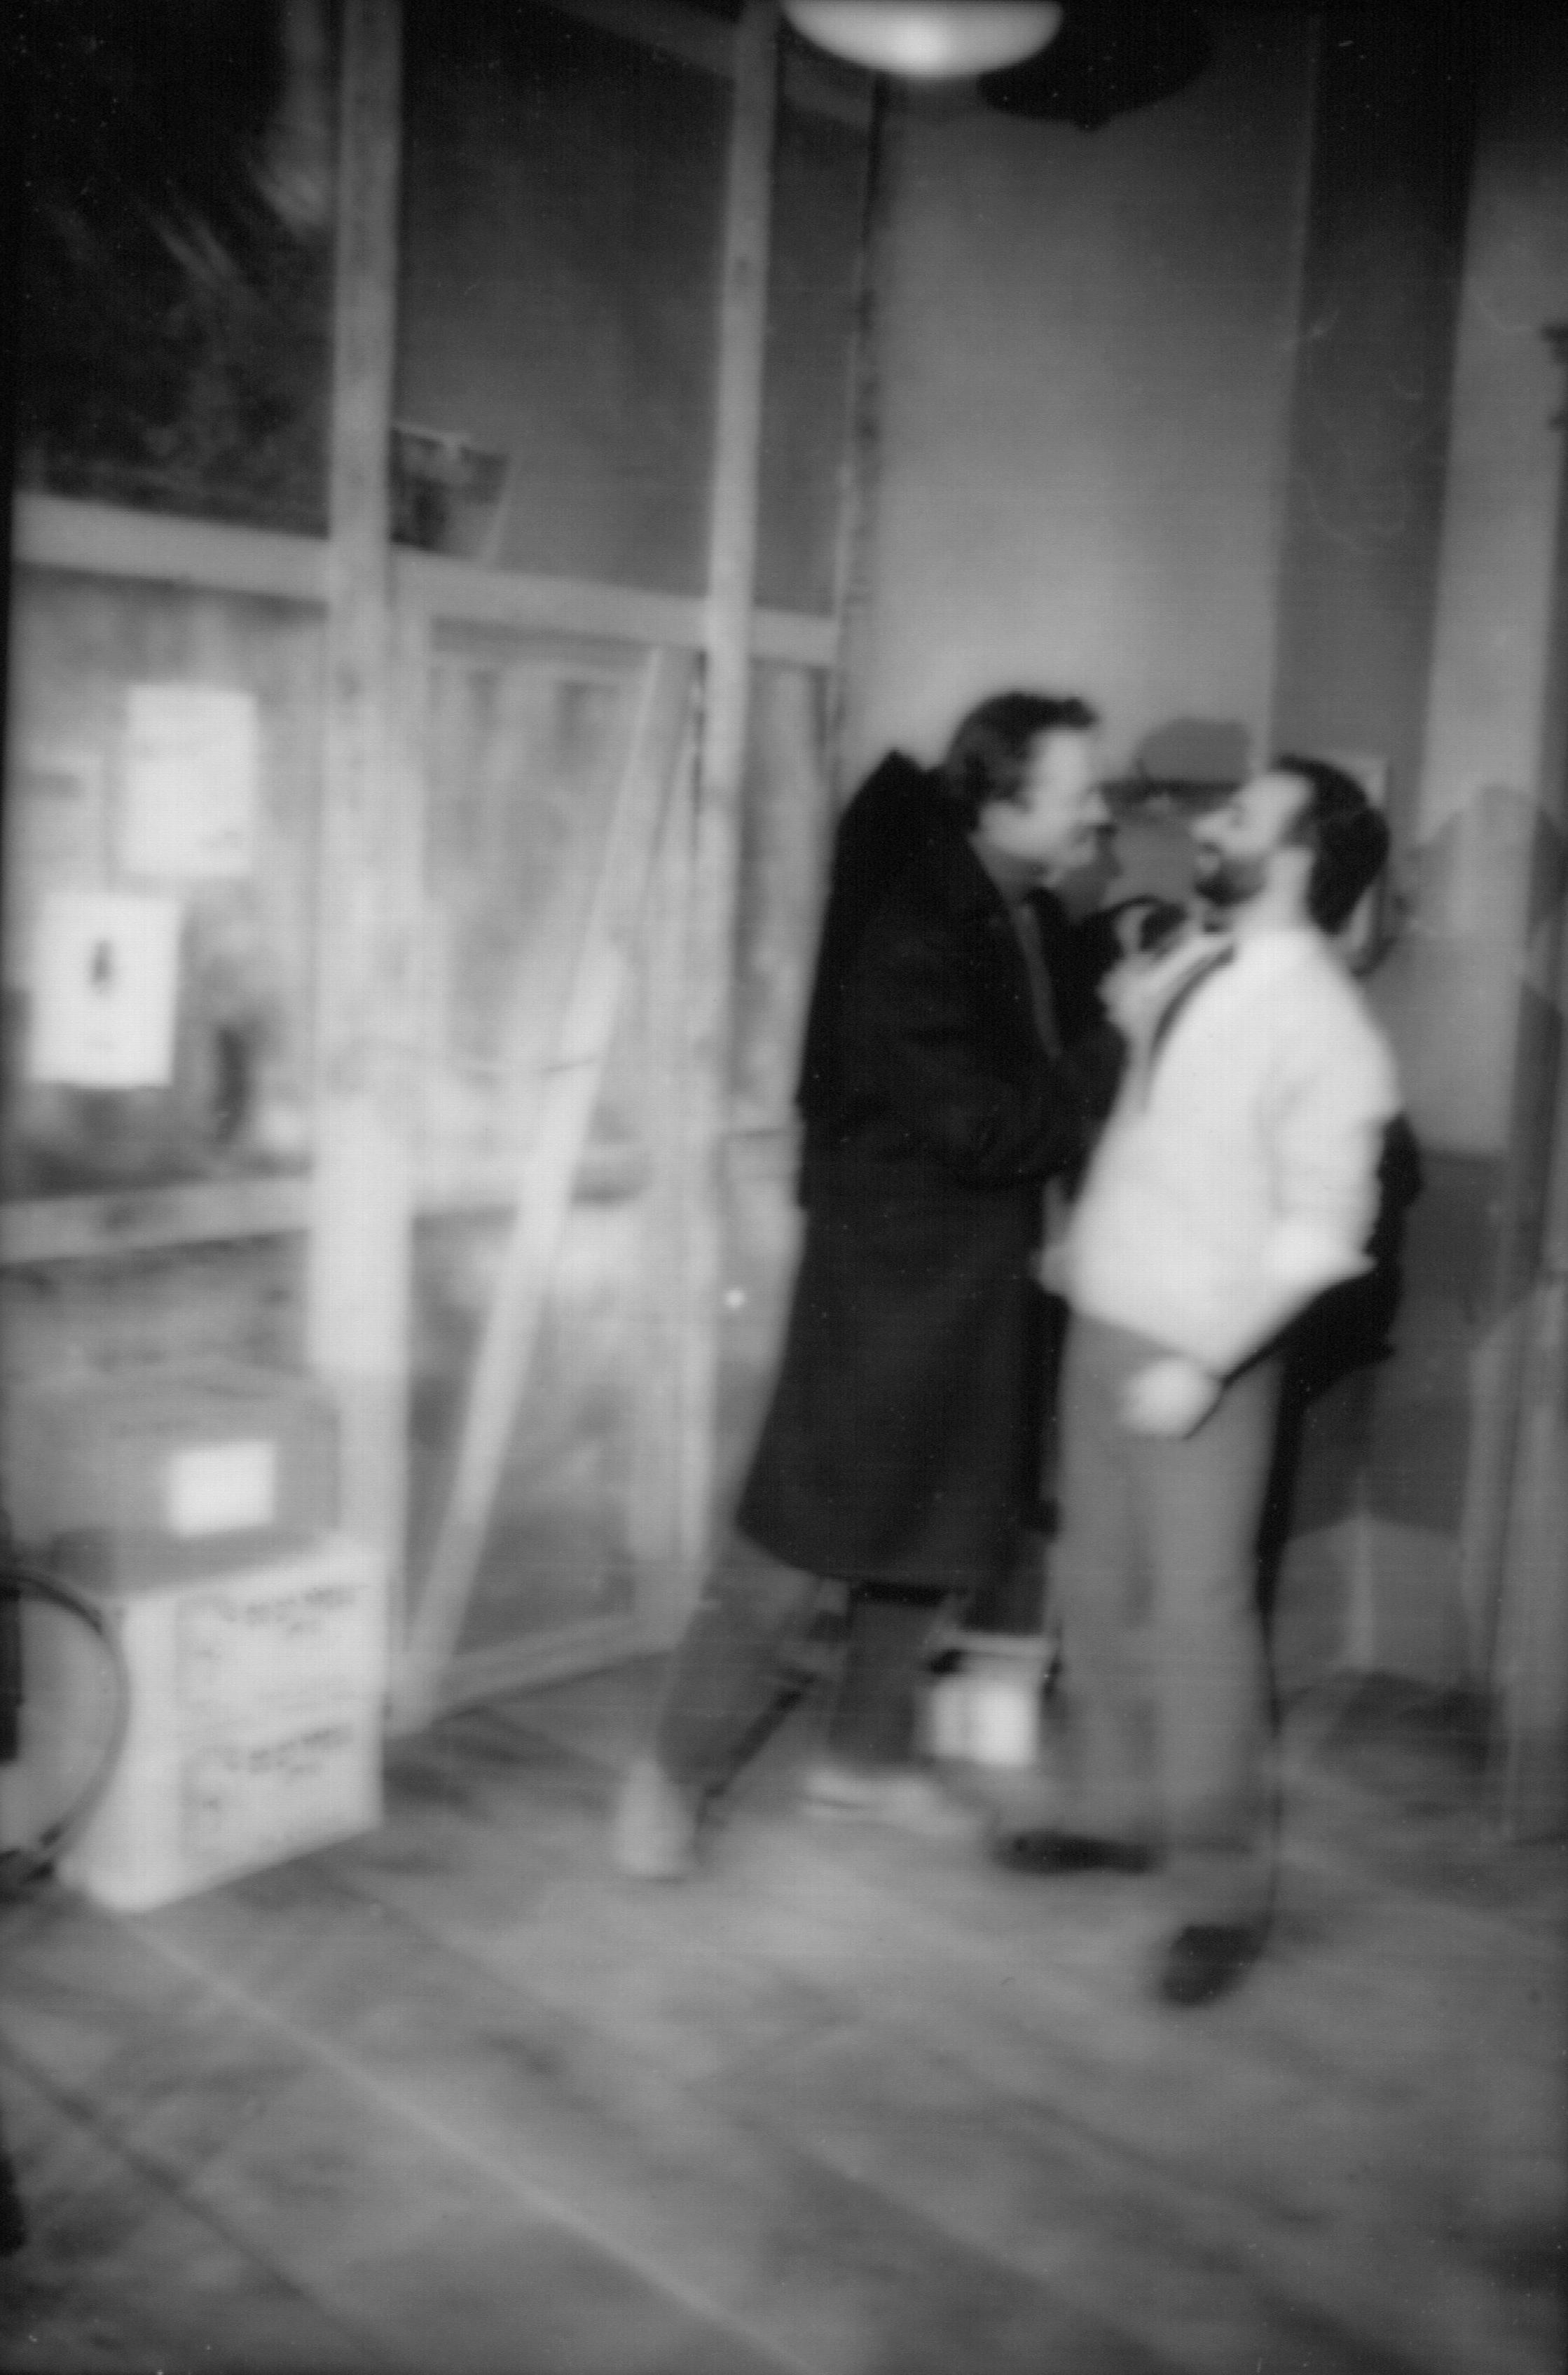 ClosingTime(January 1986) Production Image 2.jpg